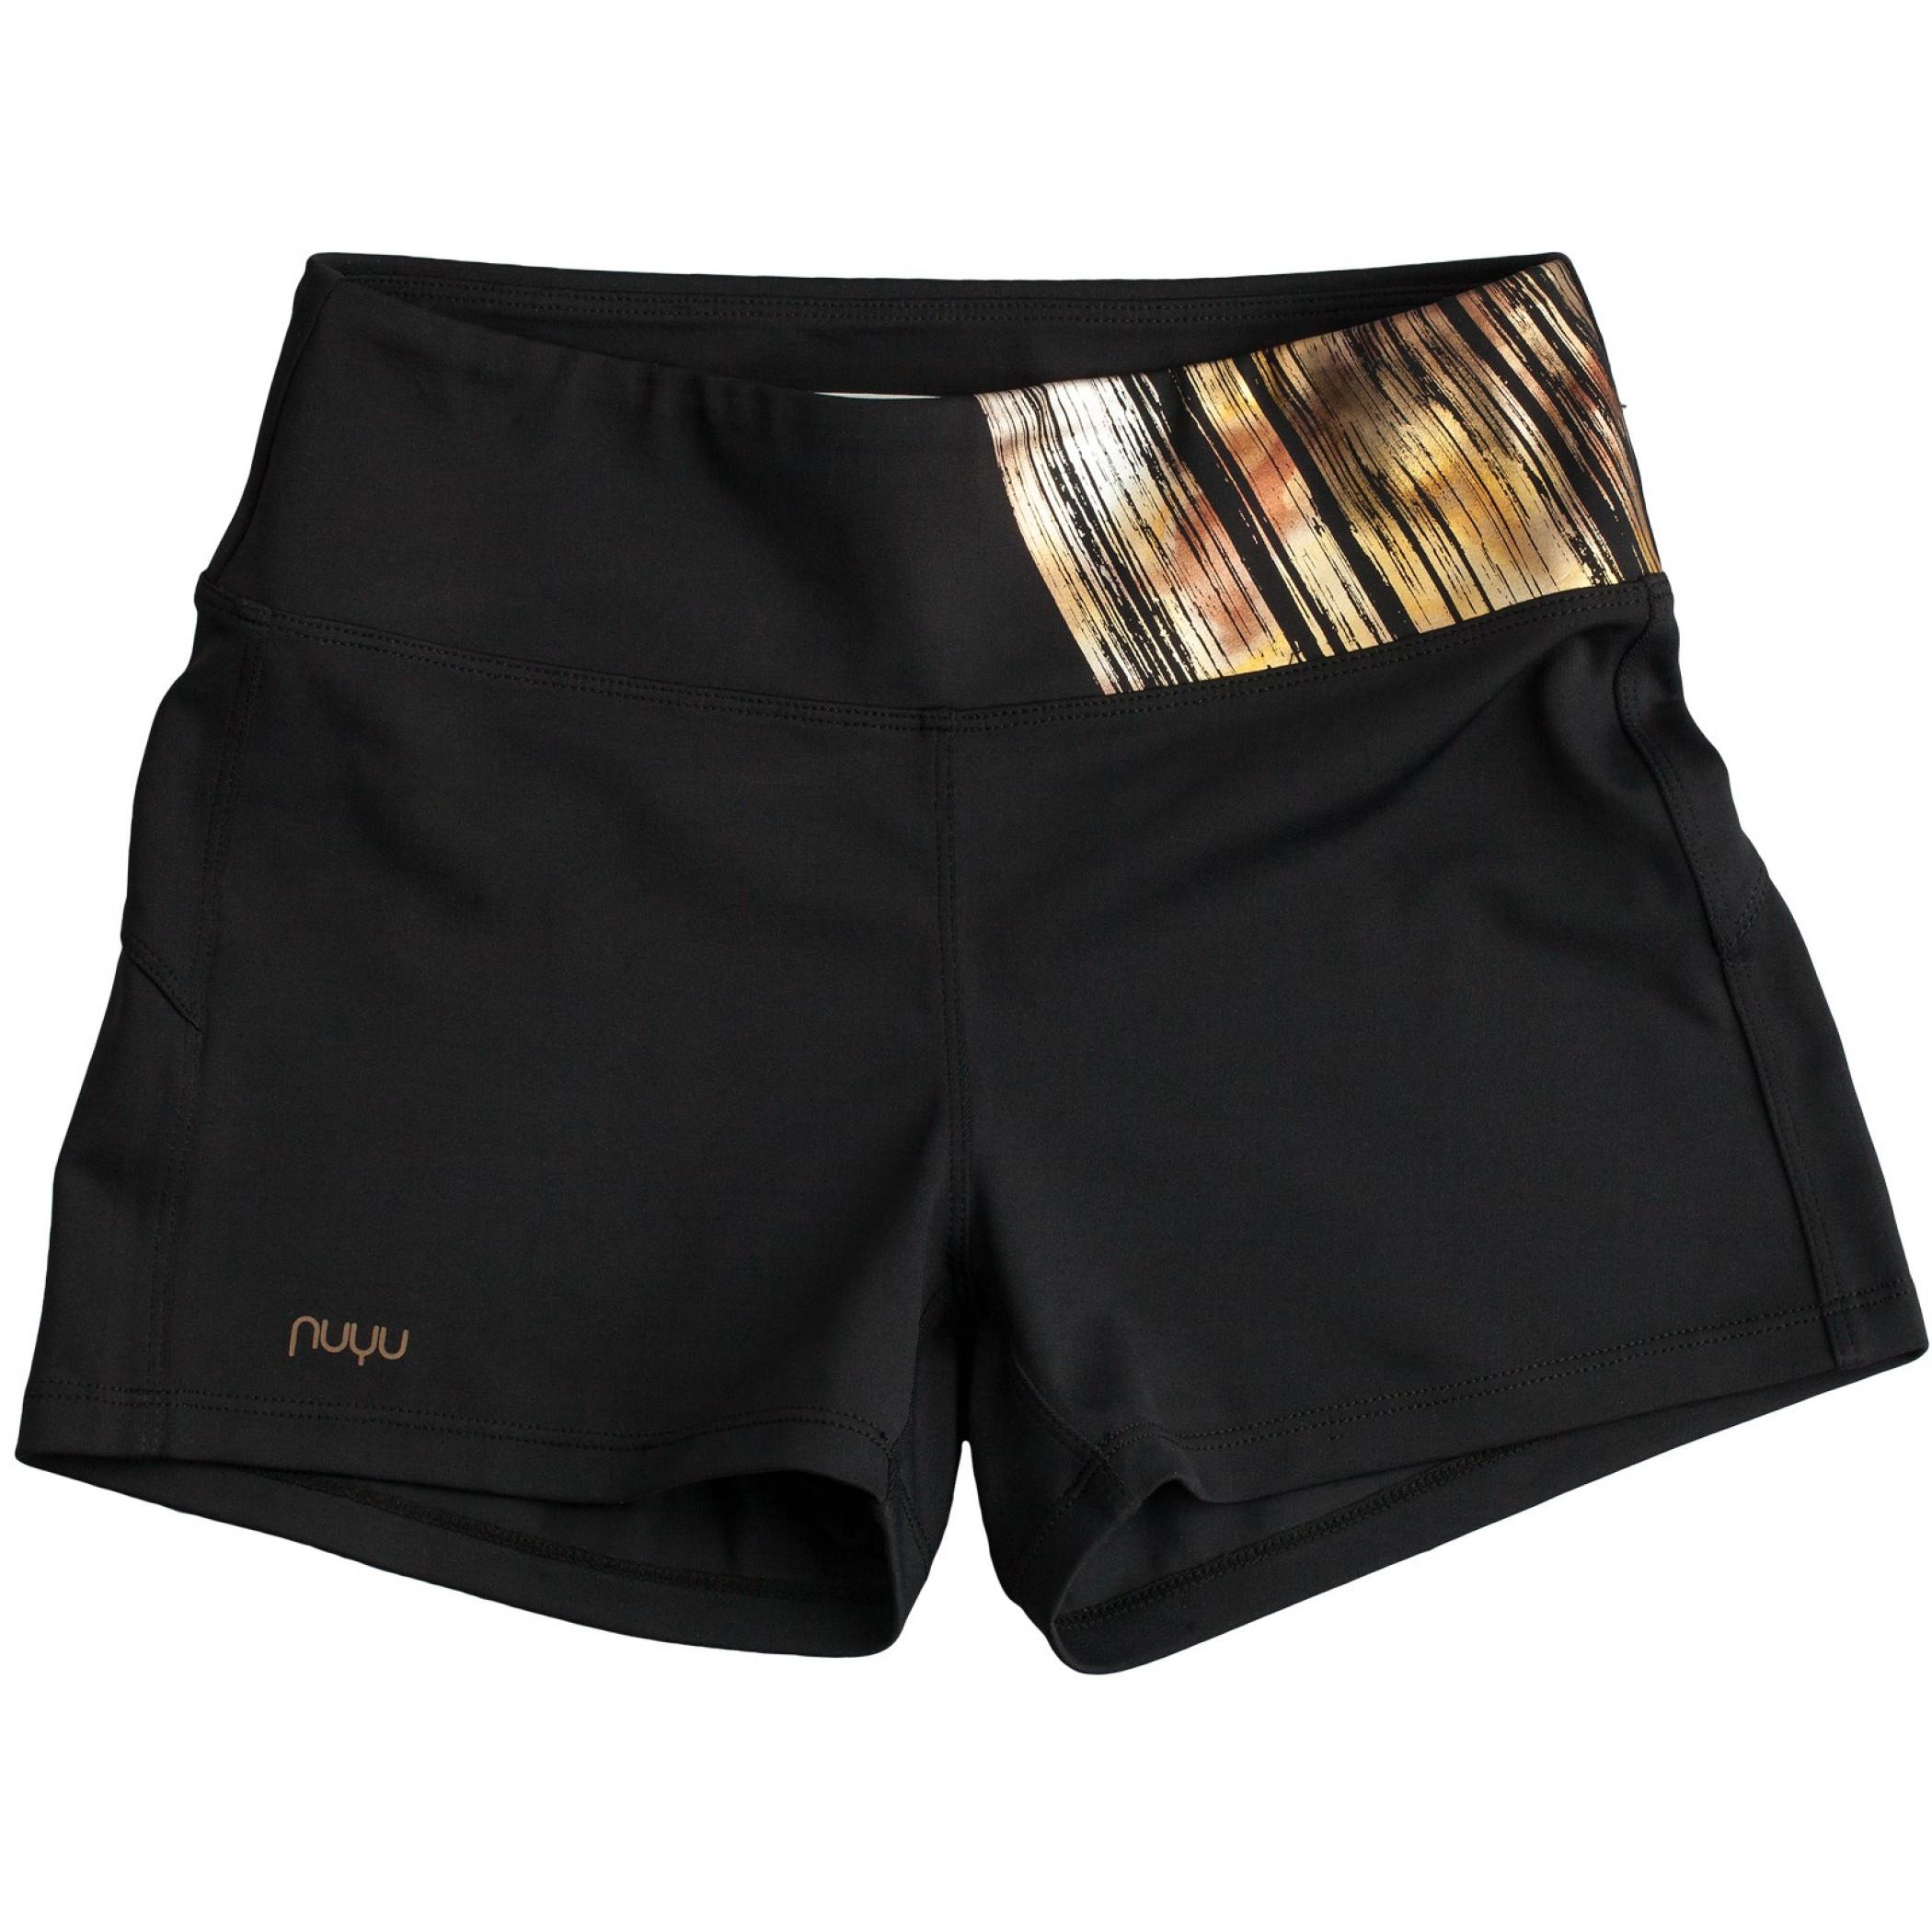 Wonder Woman Black and Gold Women's Shorts